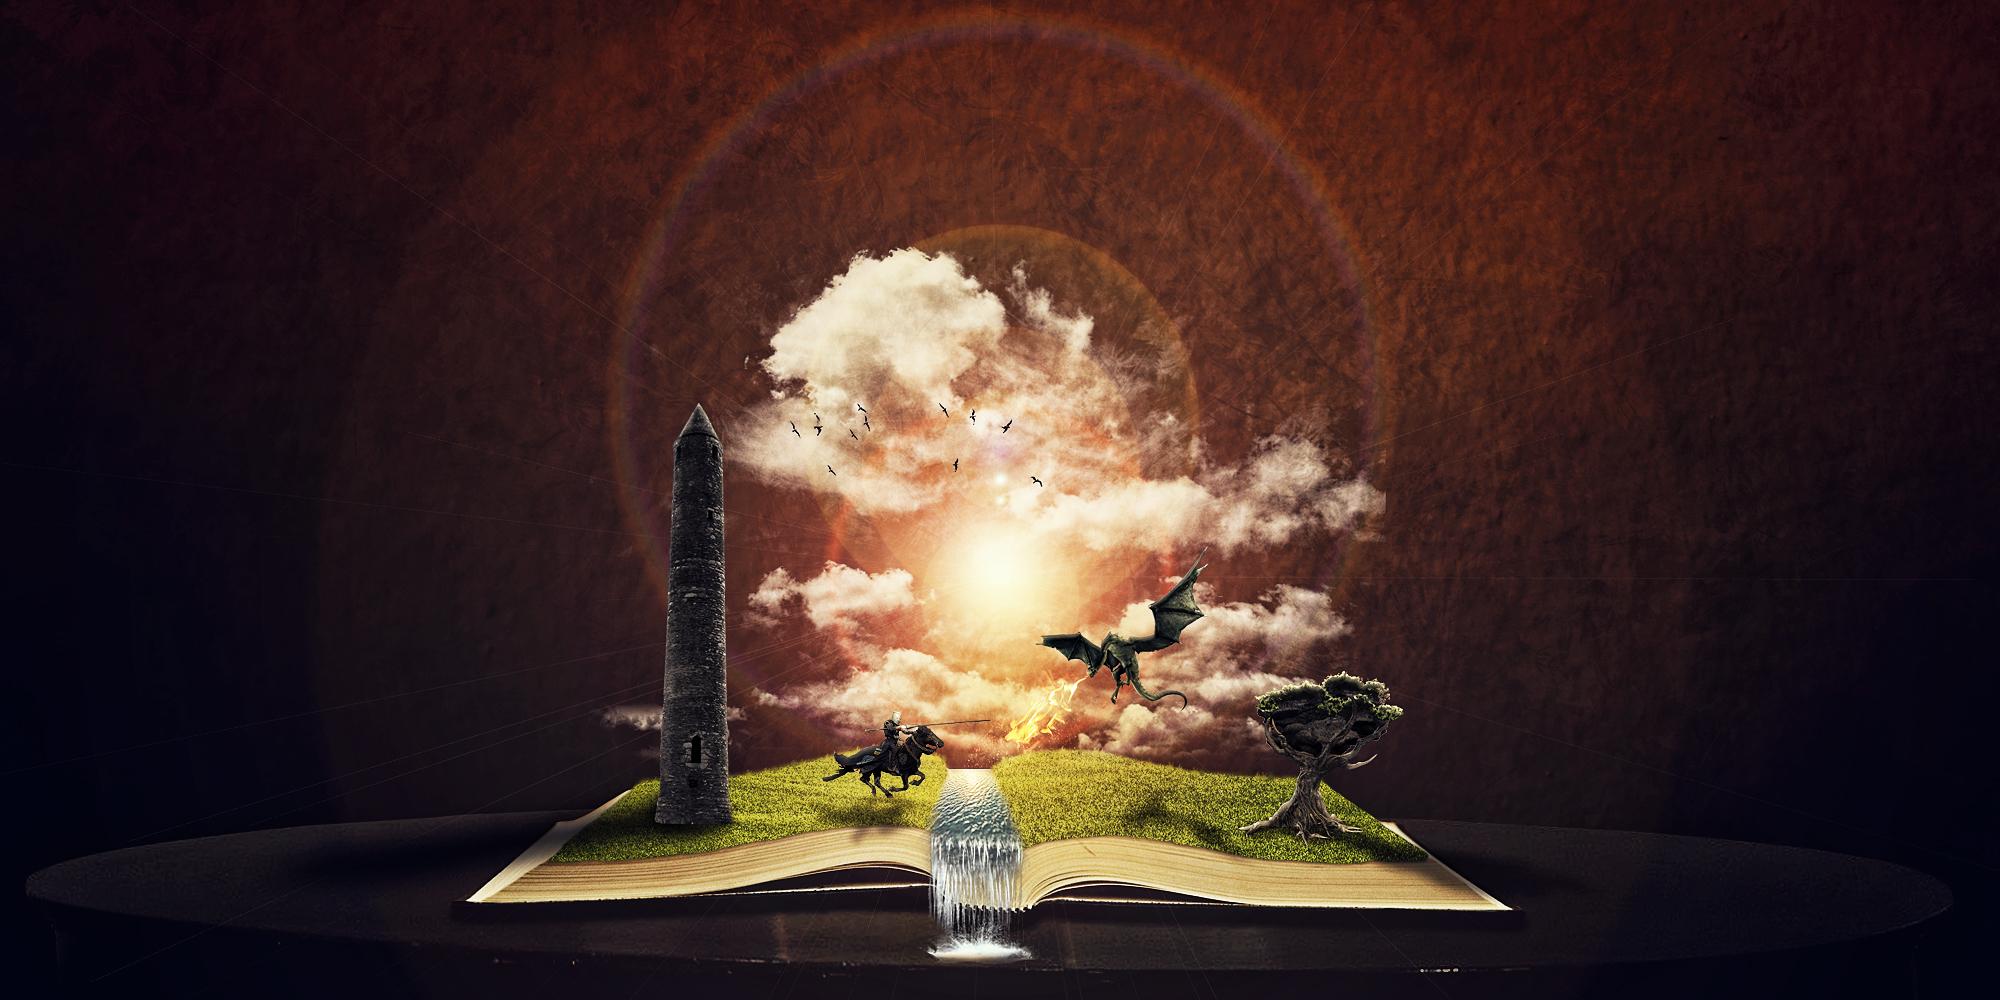 http://static.tumblr.com/260c04b97f972226cbbf9f07bb6cefa5/6pa6vew/ylbmqk6t5/tumblr_static_magic-book.jpeg